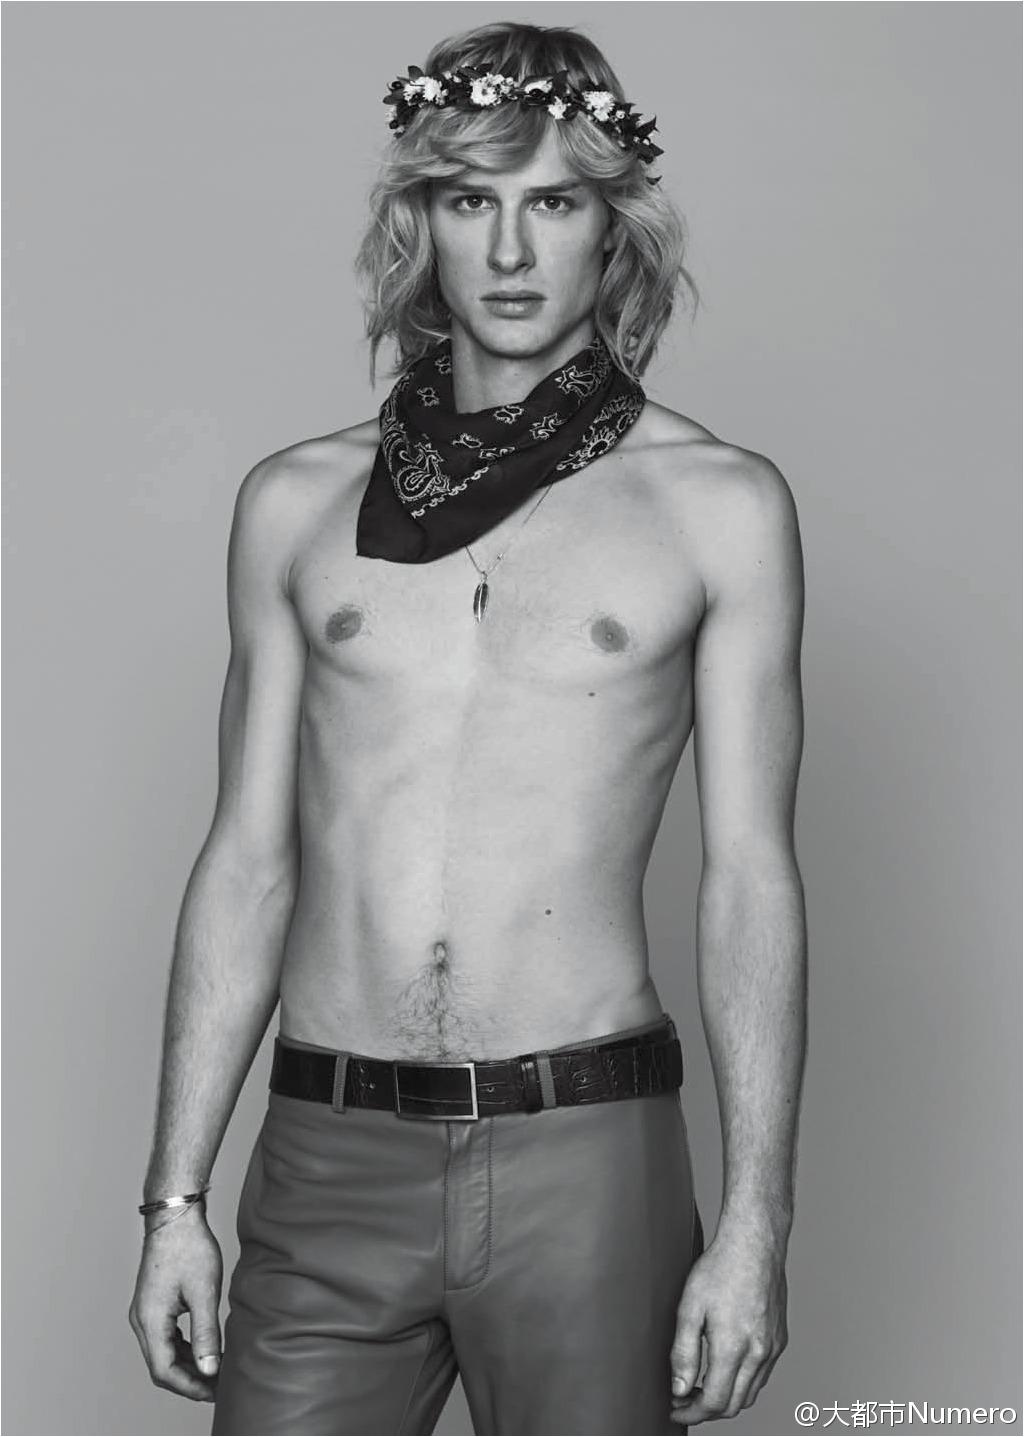 Frederik Meijnen Rocks Bohemian Fashion Styles for Numéro Homme China